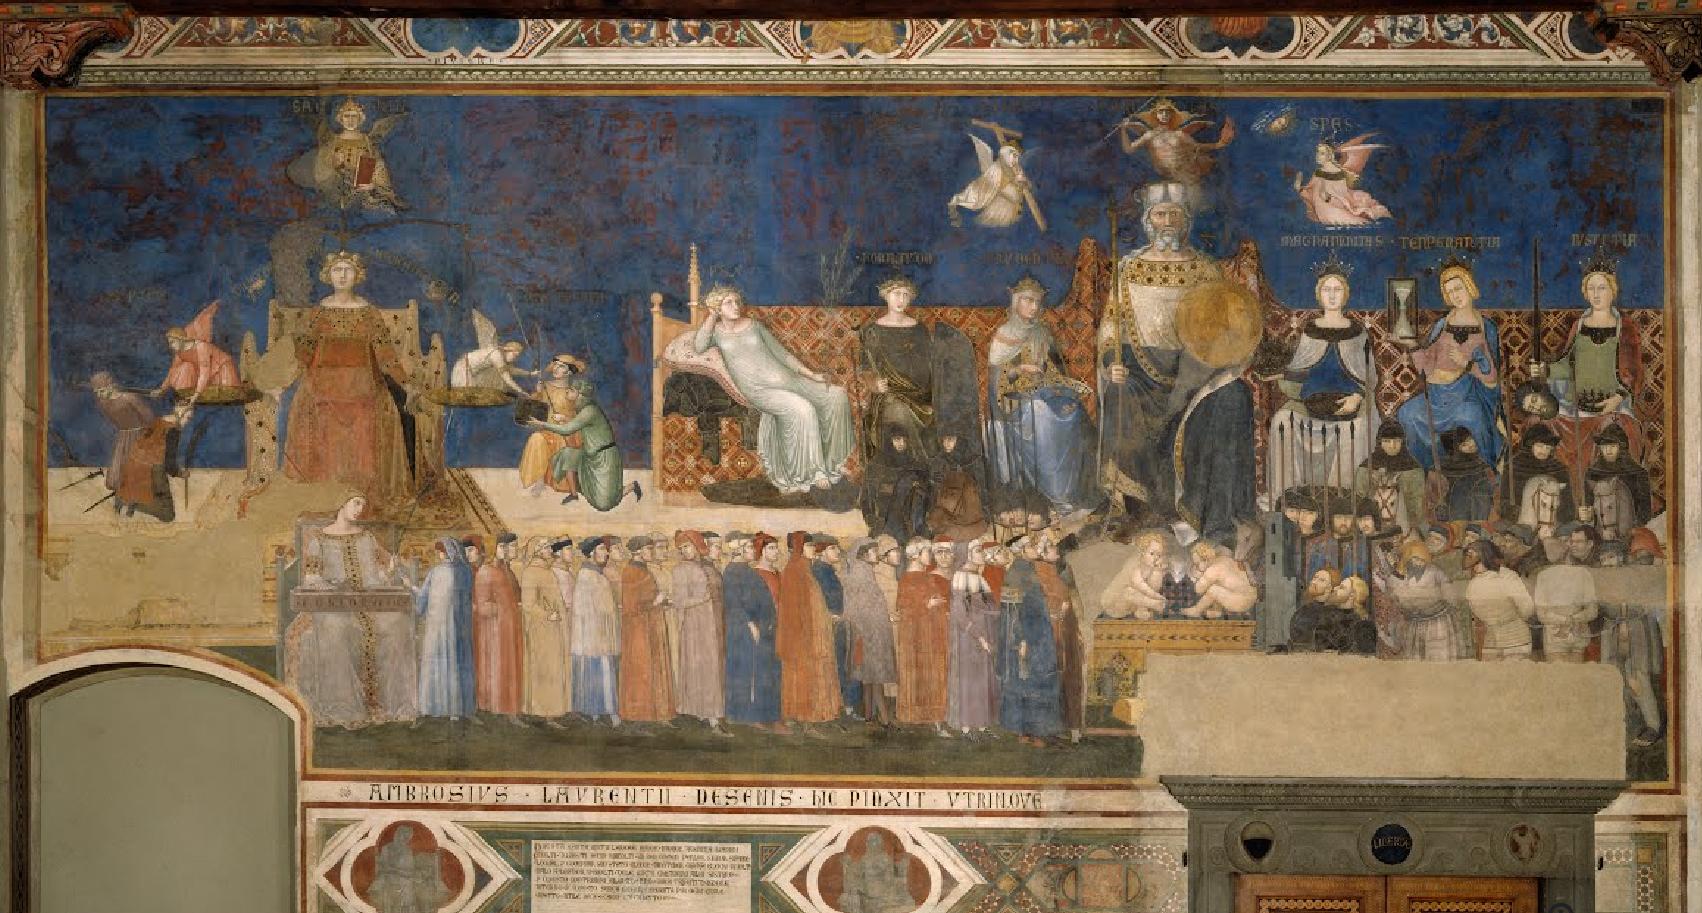 Allégorie du Bon Gouvernement Ambrogio Lorenzetti 1338 - 1339